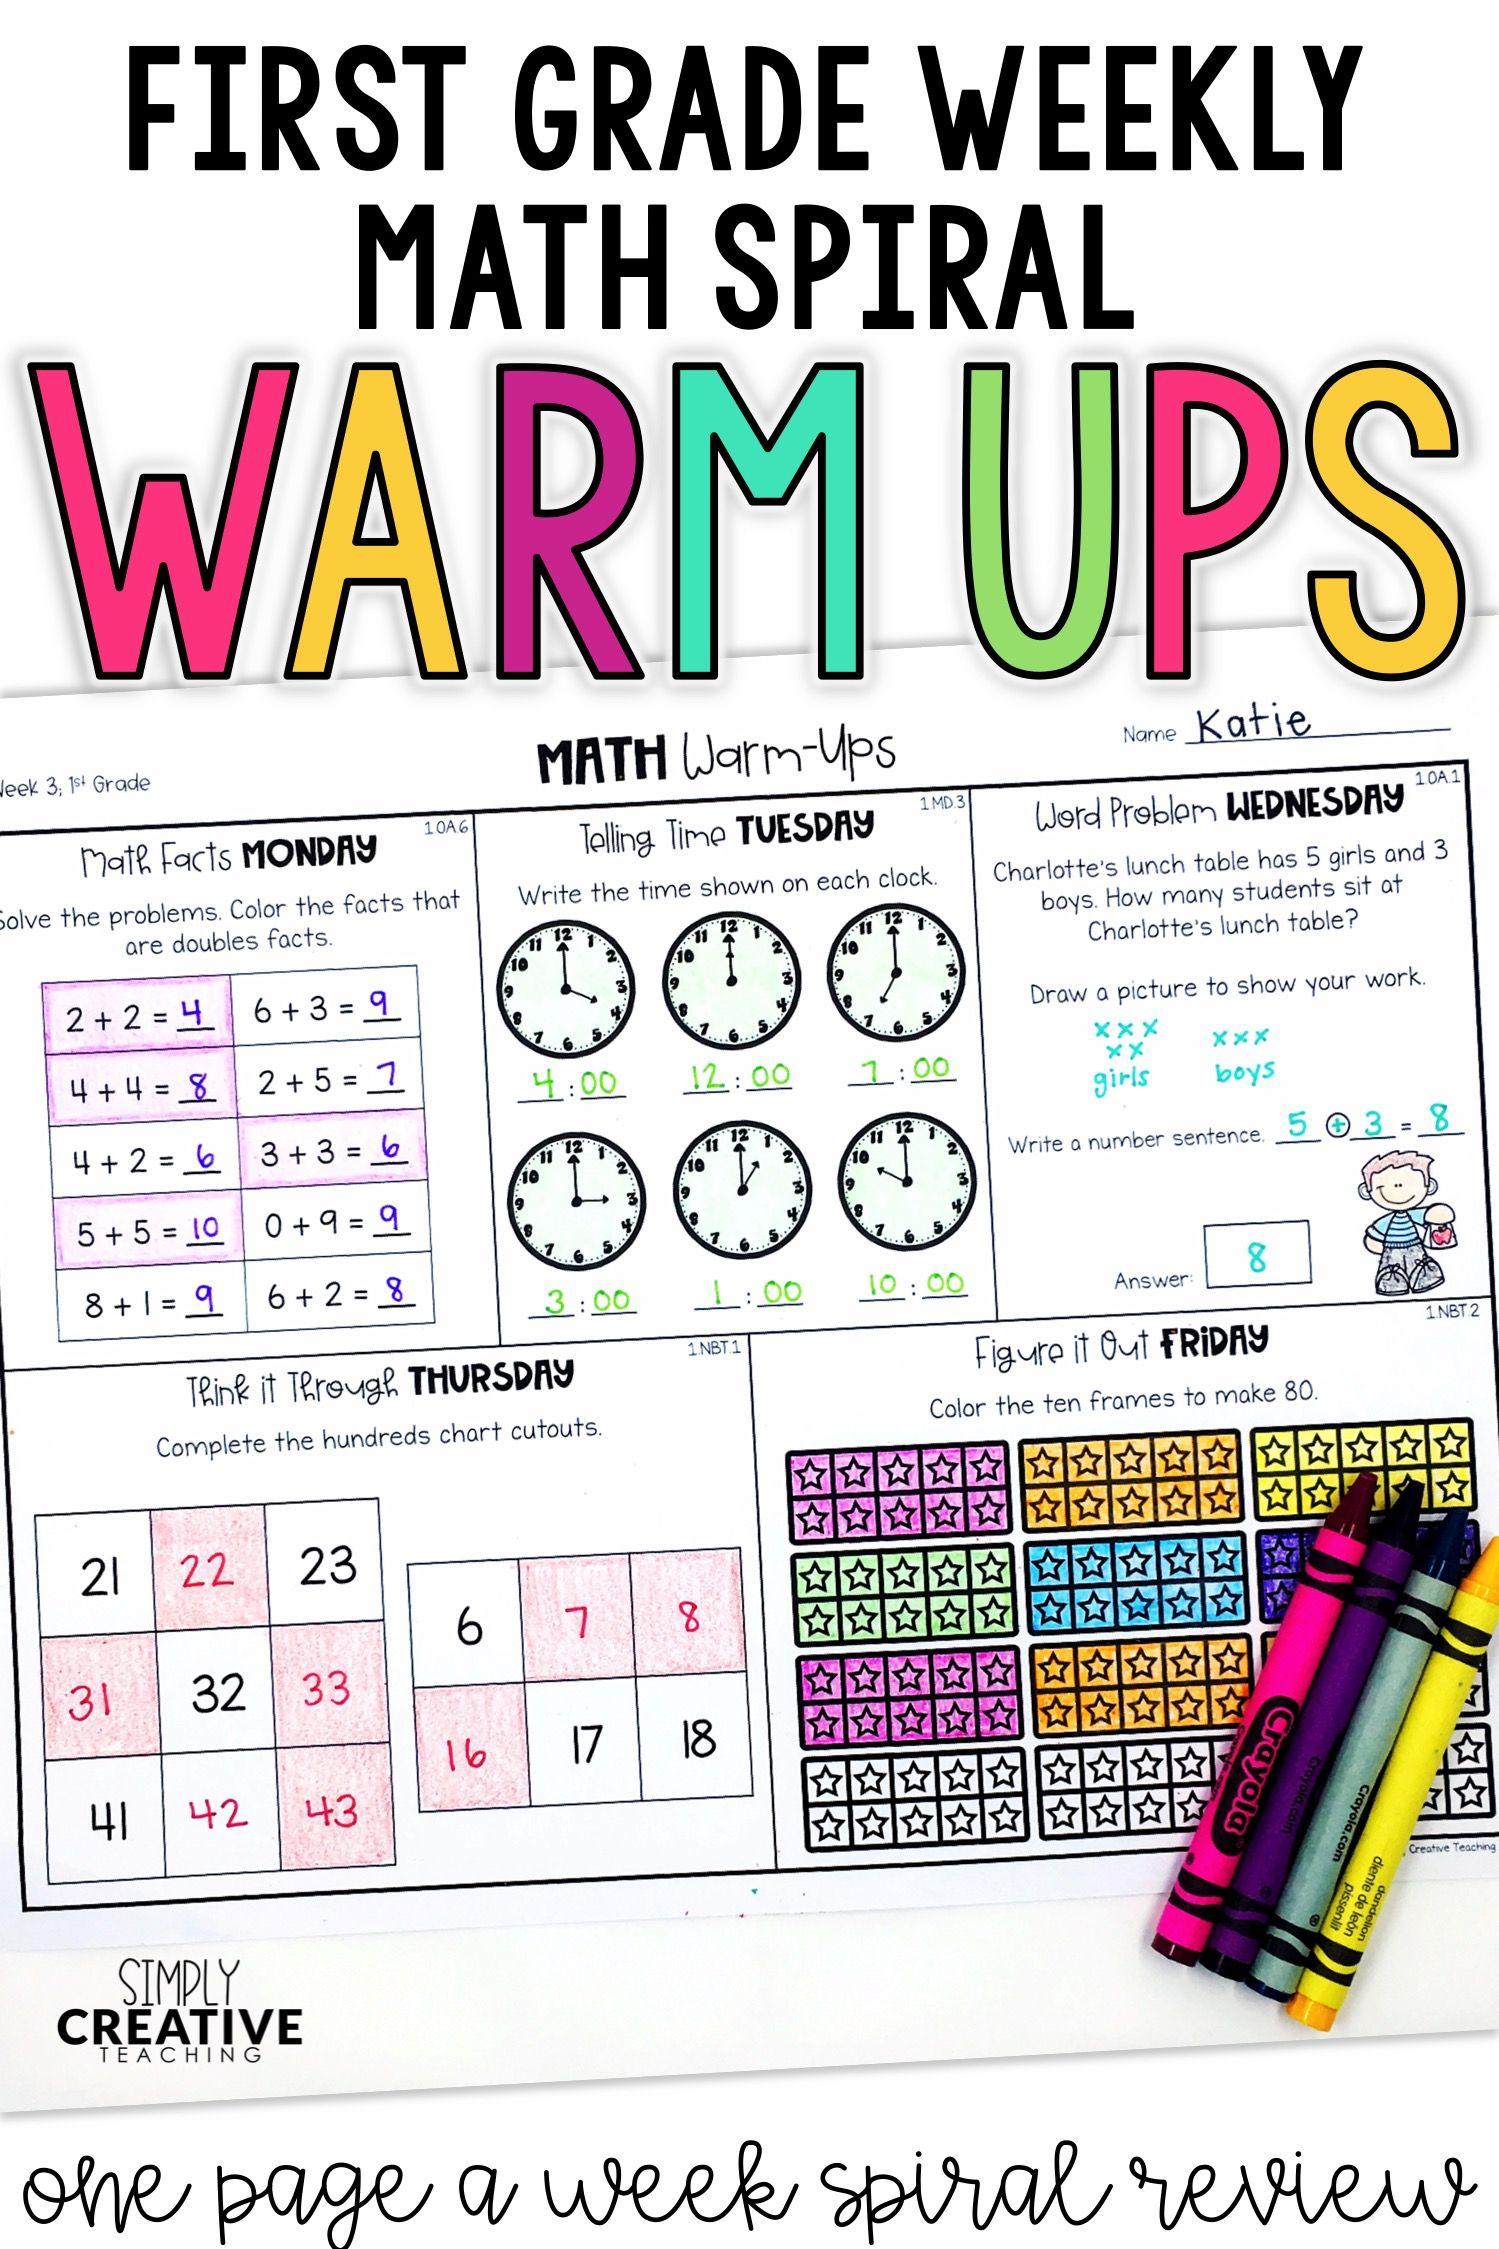 Quick Ideas For Spiral Review Math Warm Ups